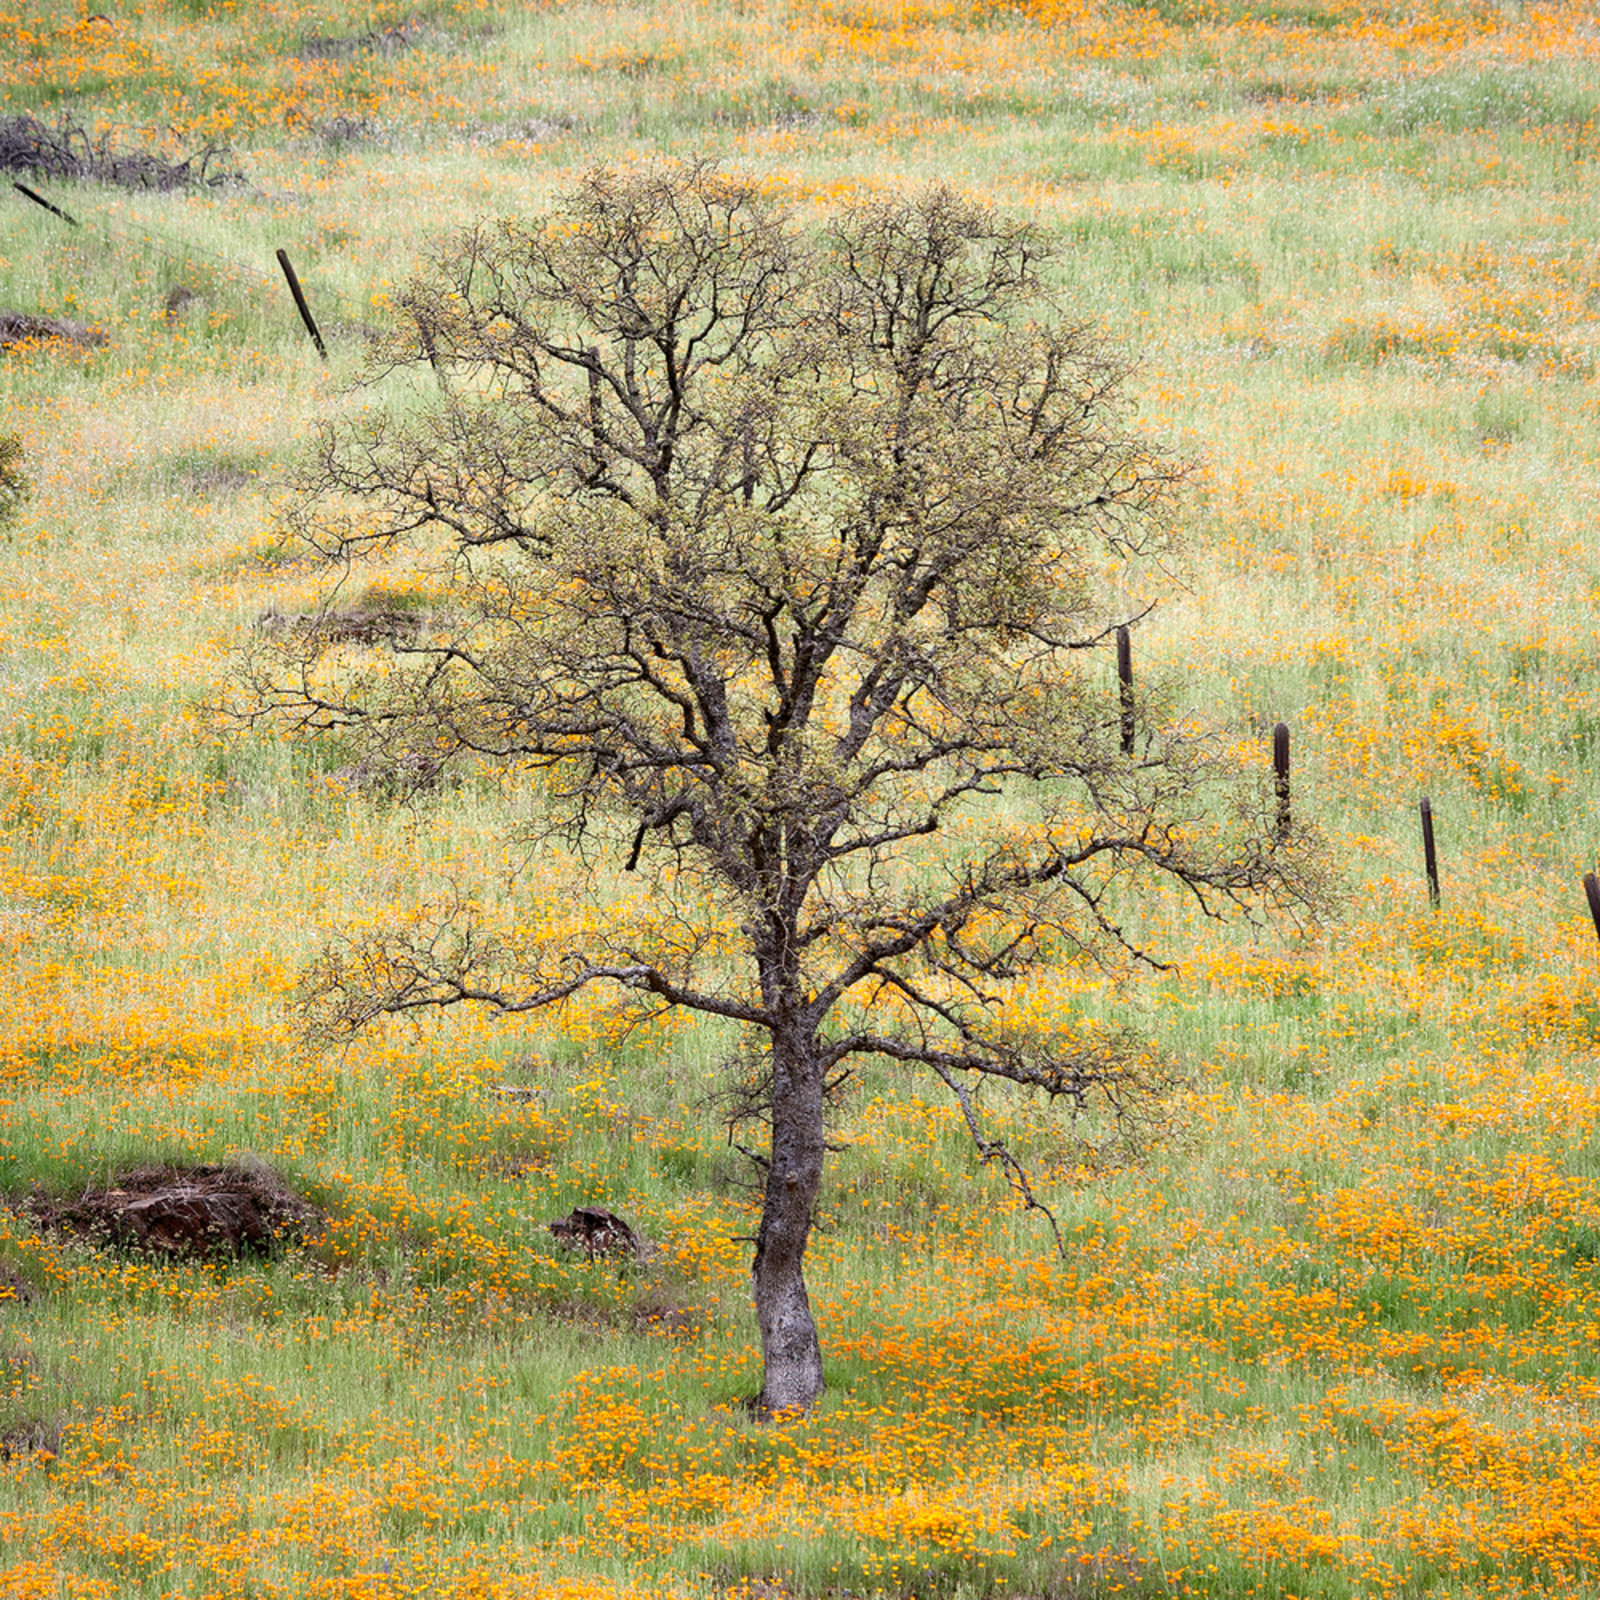 Lone oak and poppies dgq07y